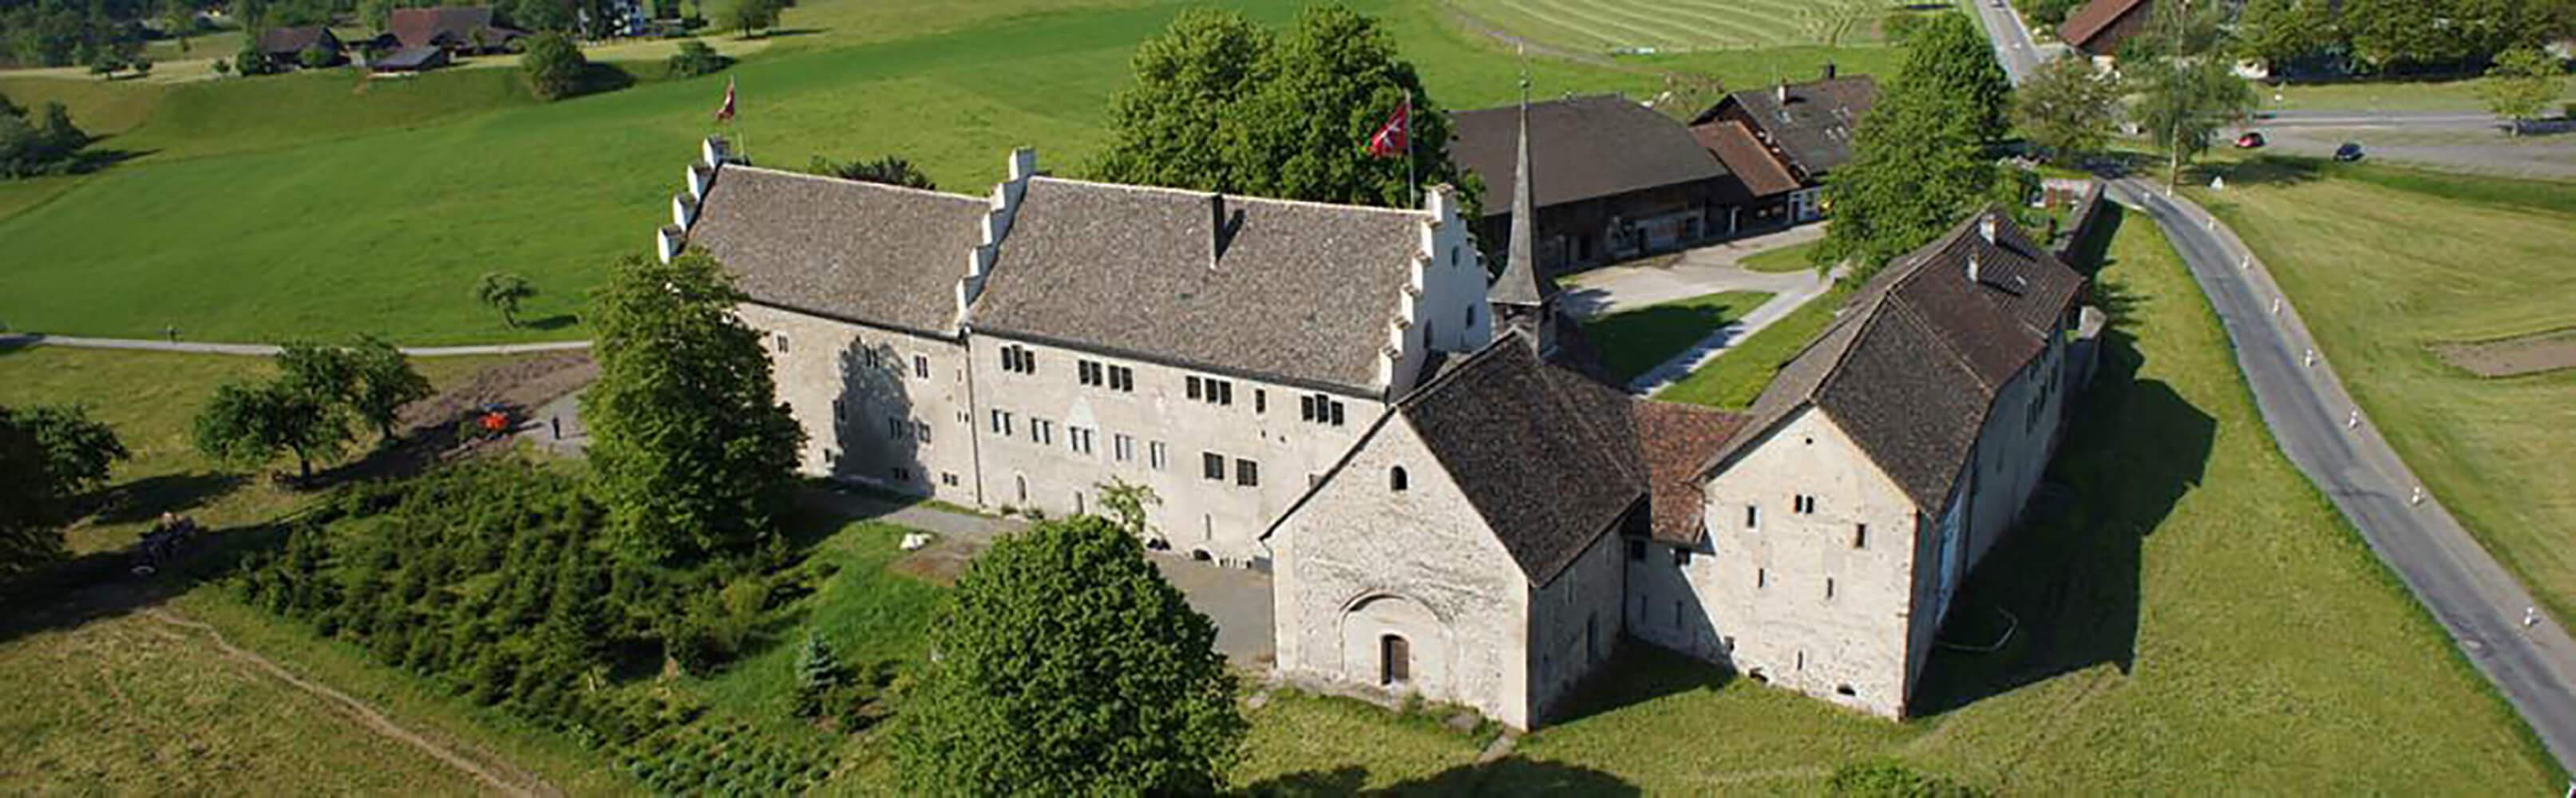 Ritterhaus Bubikon 1